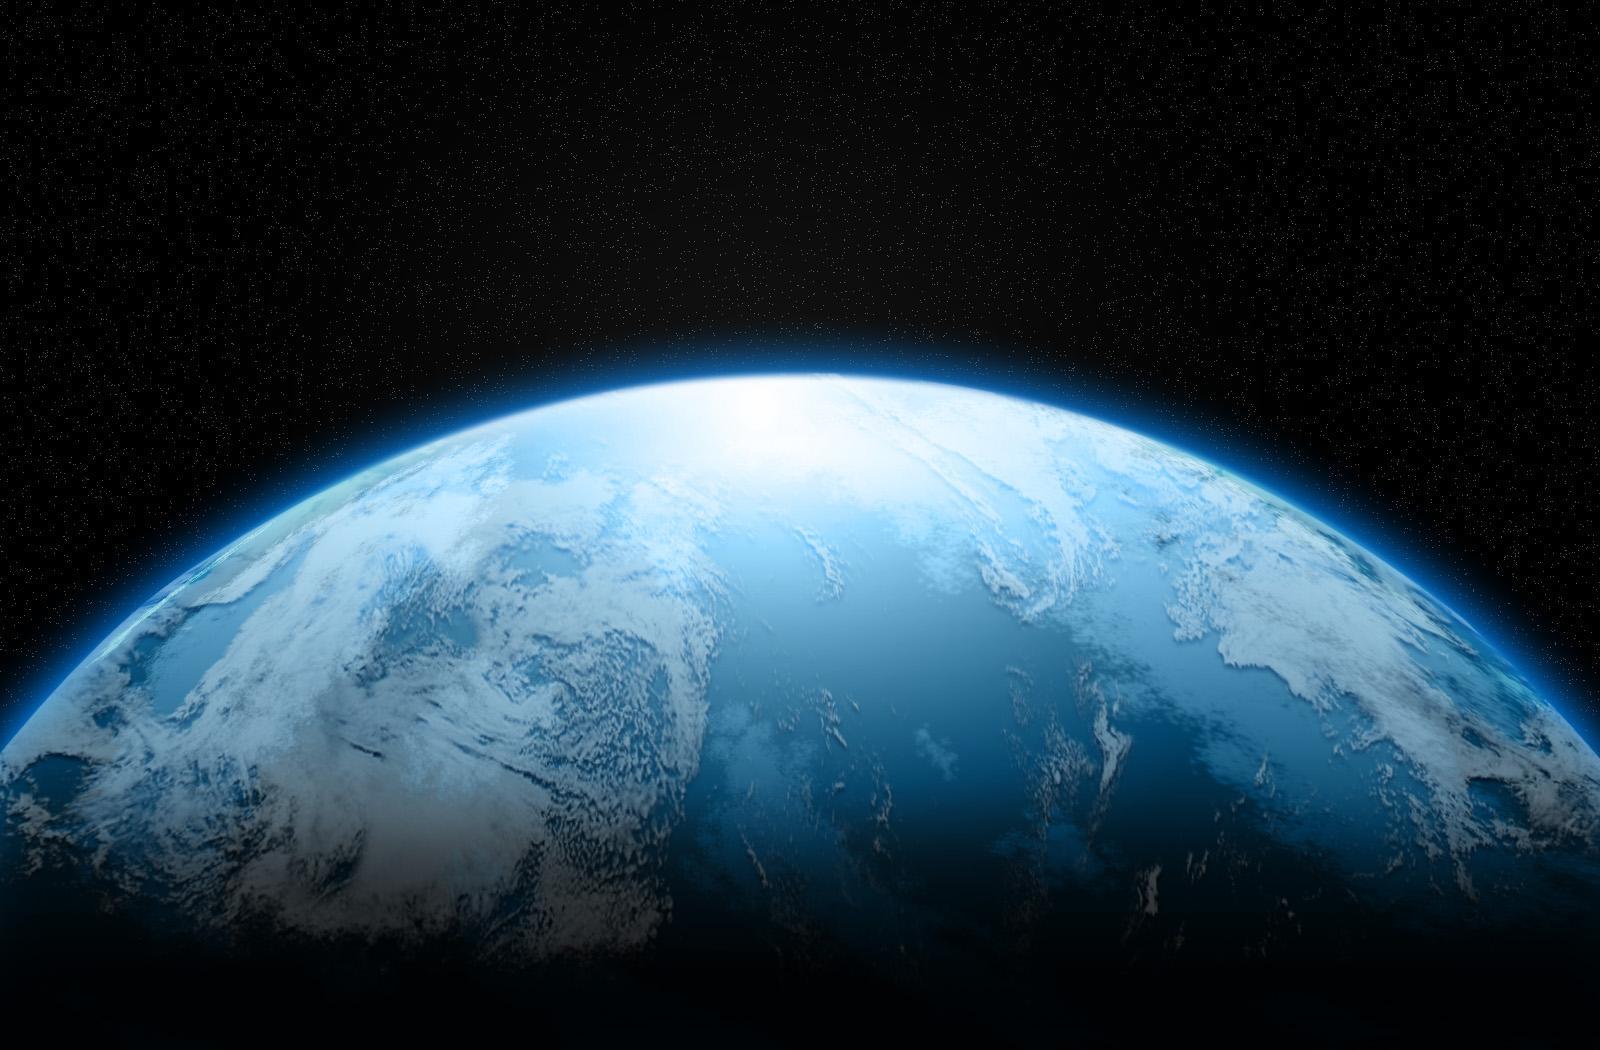 Zemyata Ot Kosmosa Earth From Space Hd Wallpaper Wallpaper